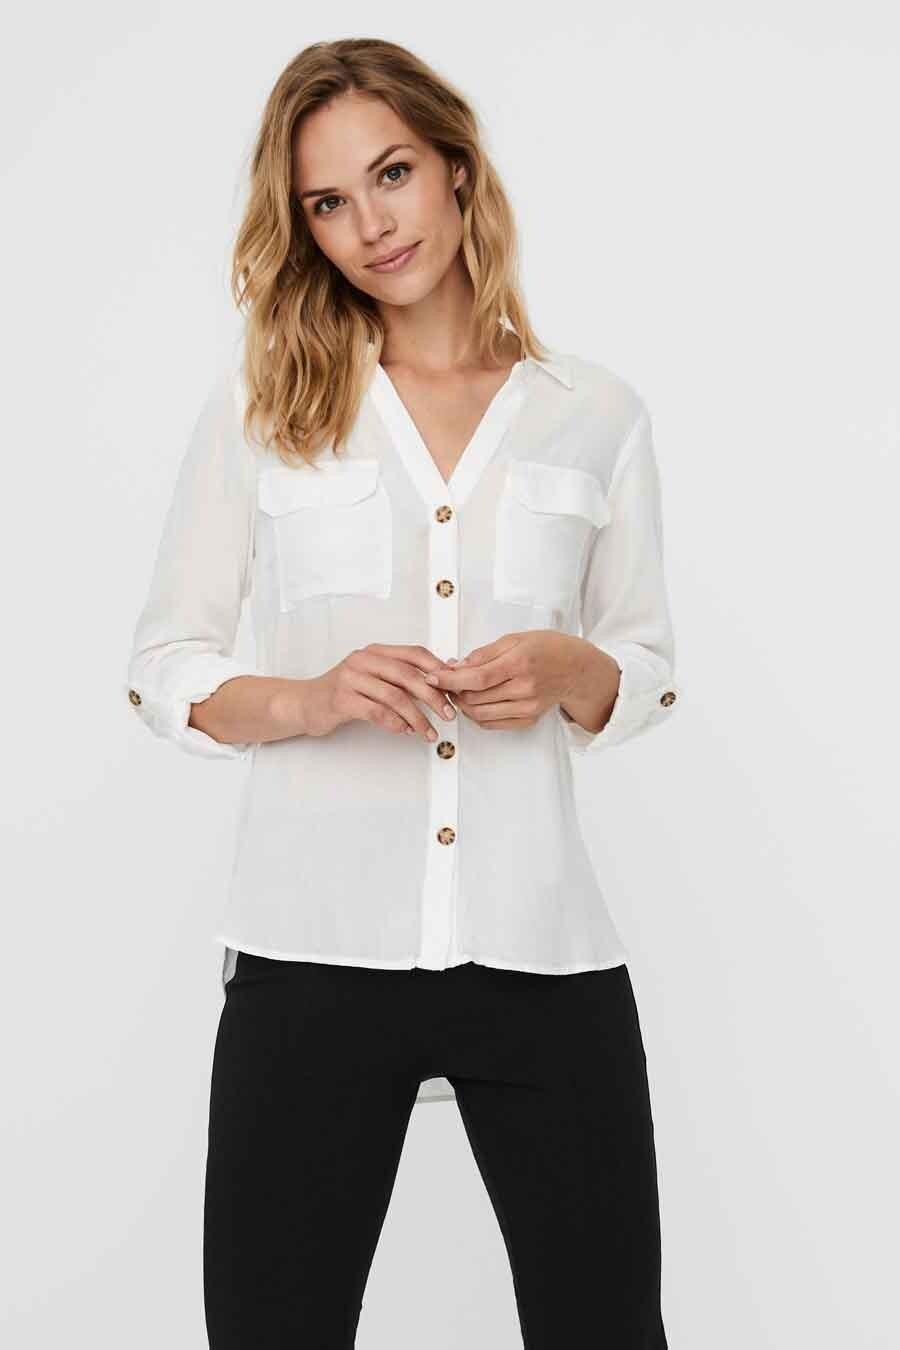 Vero Moda® Blouse lange mouwen, Wit, Dames, Maat: L/M/S/XL